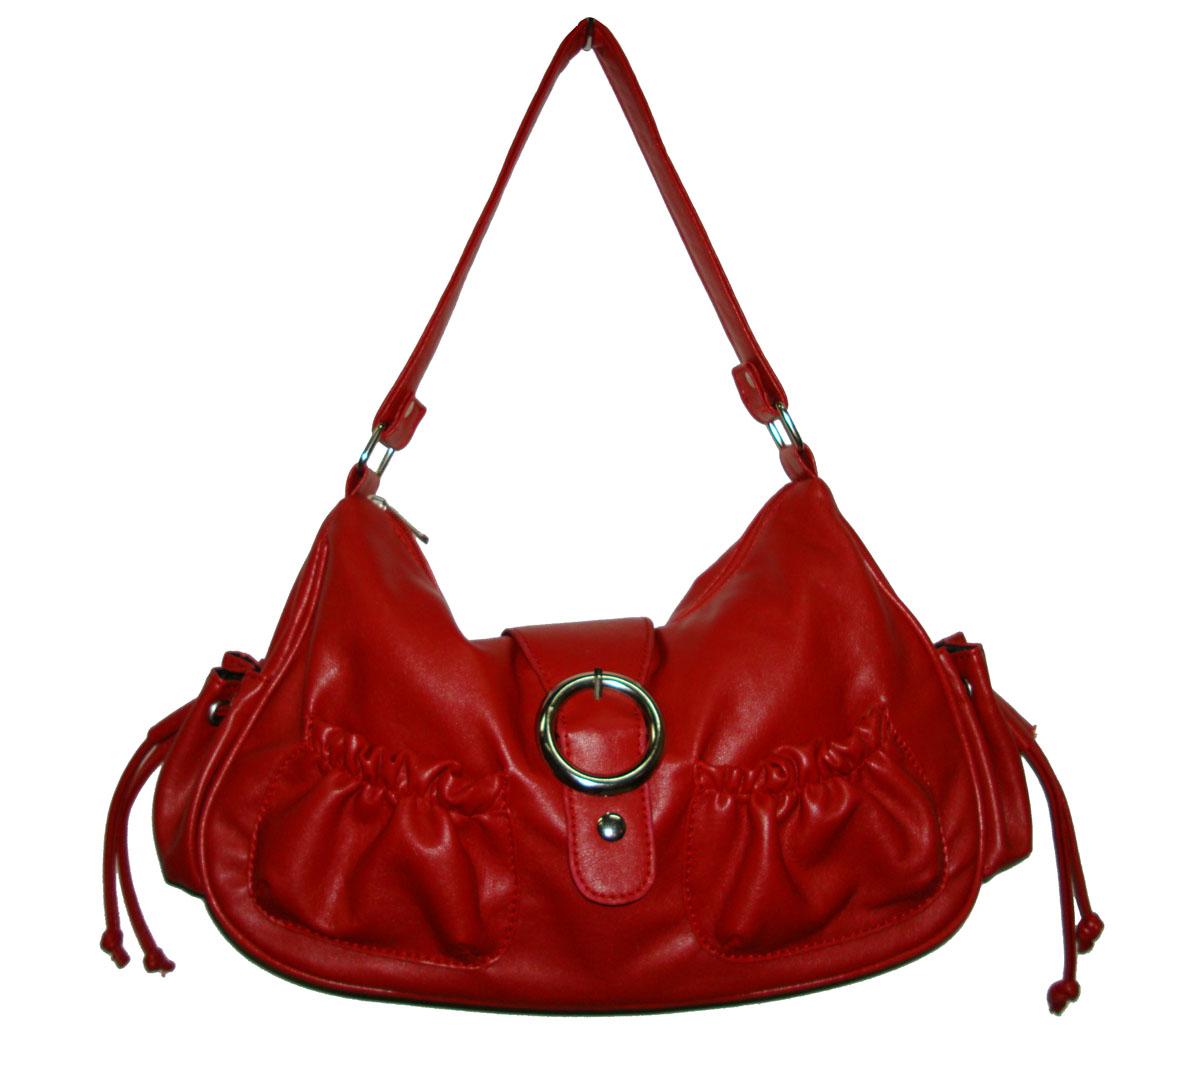 New Fashion Styles: Latest Ladies Handbags Design 2013